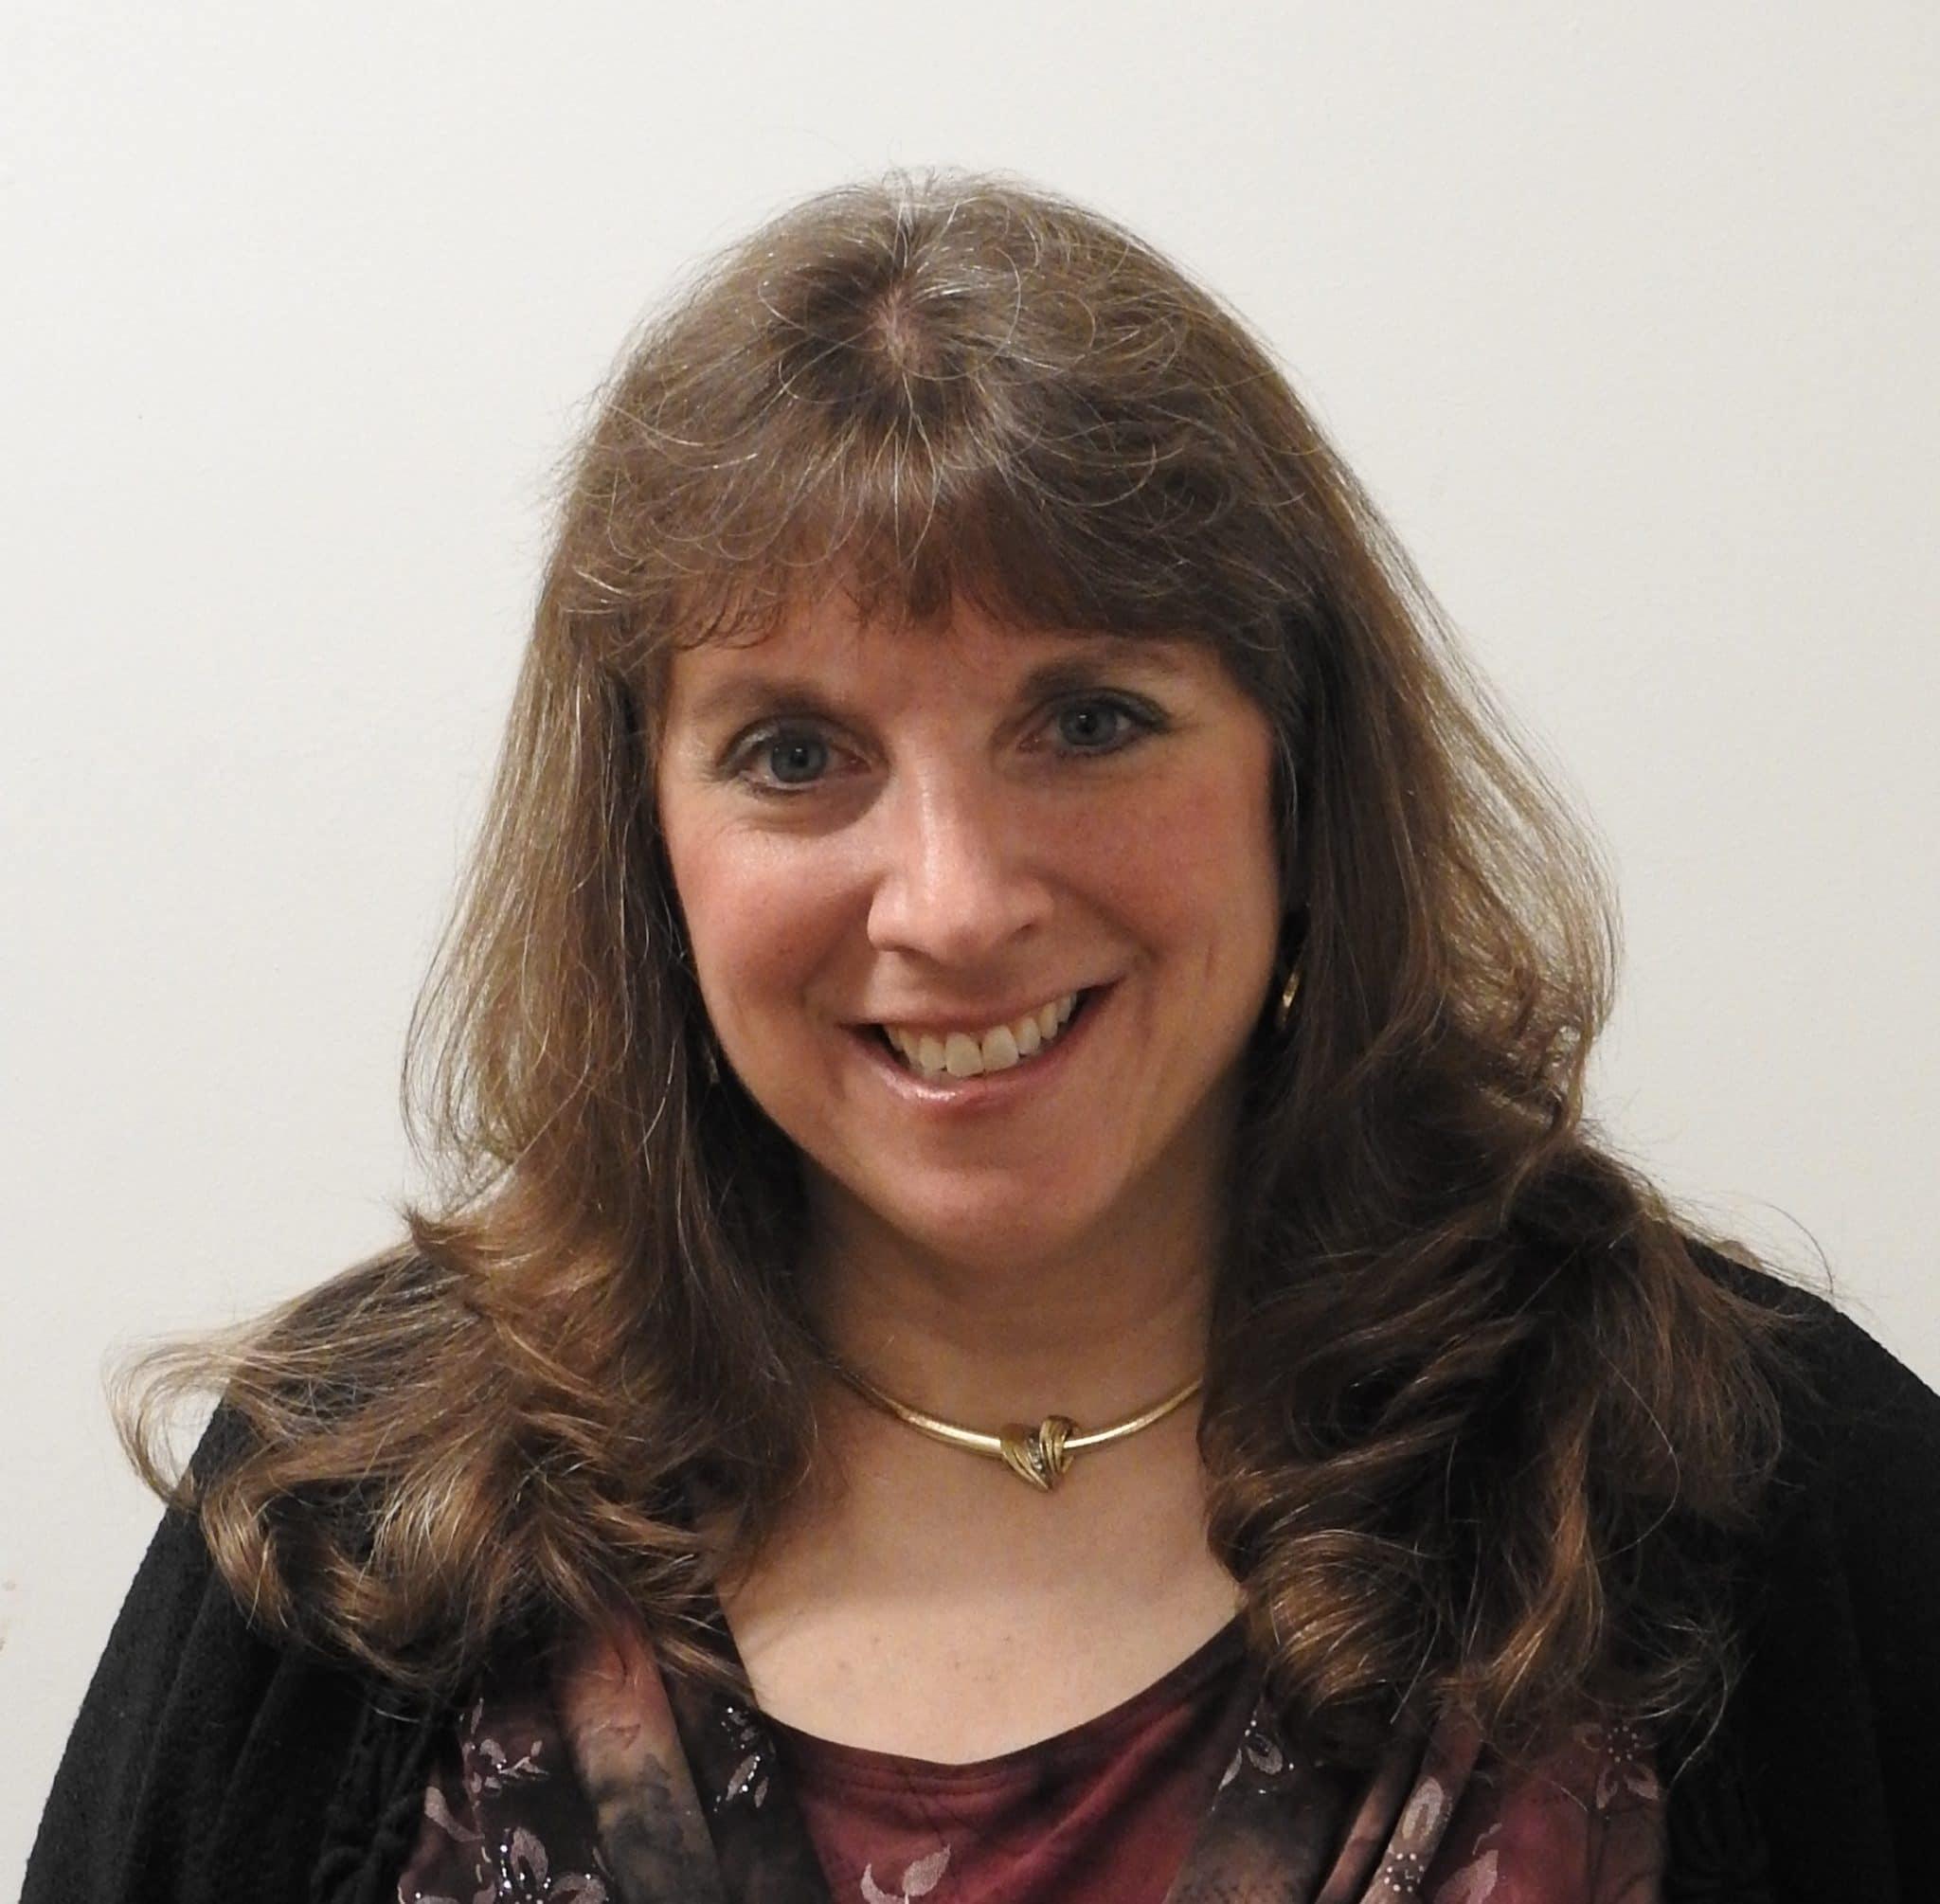 Cindy Lawrence Momath